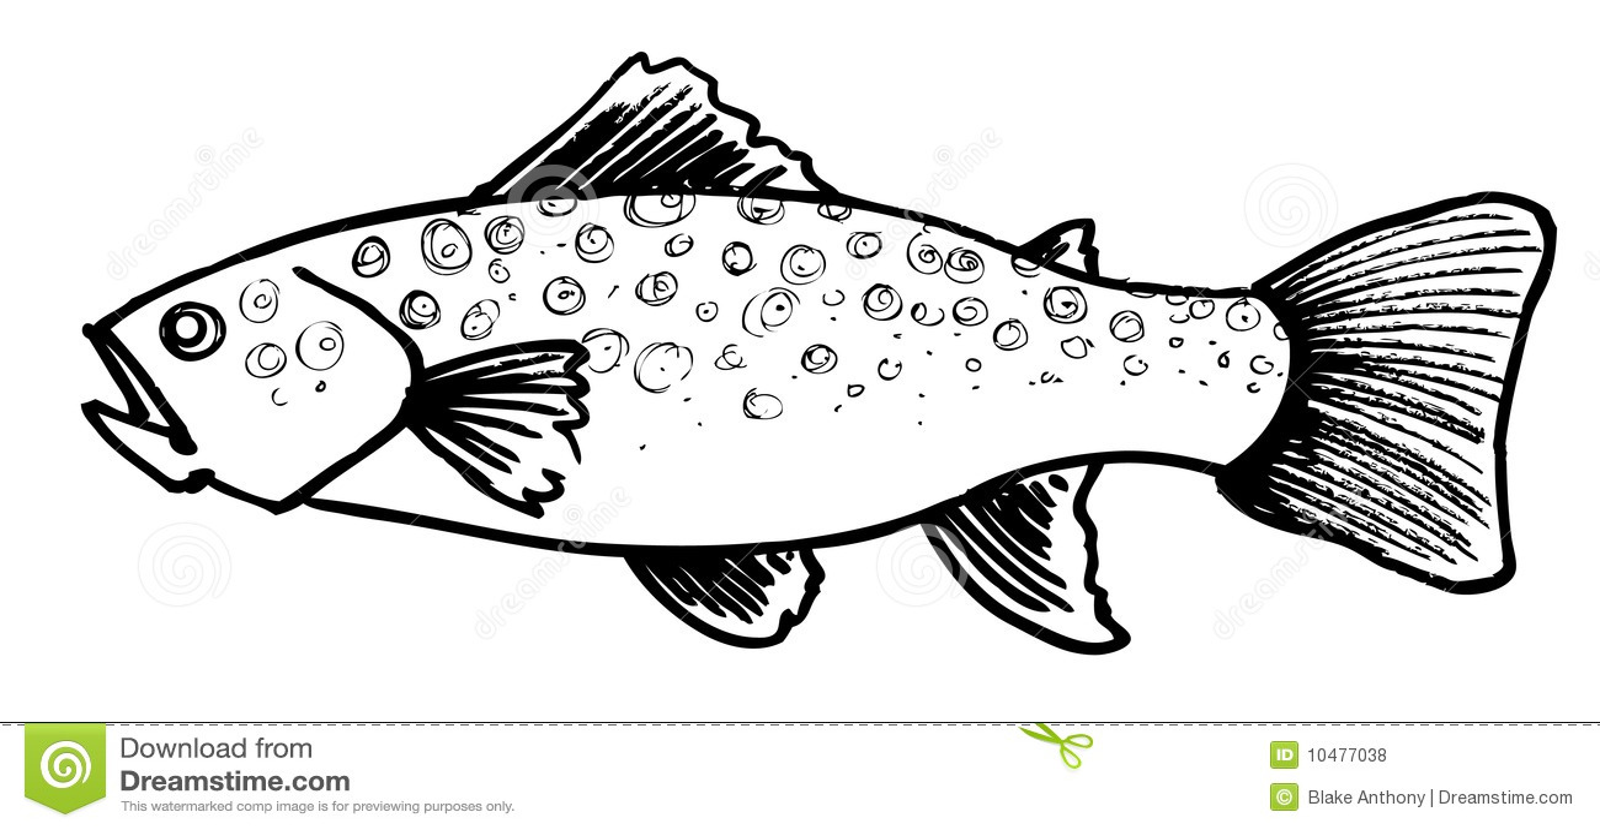 Goldfish clip art black and white